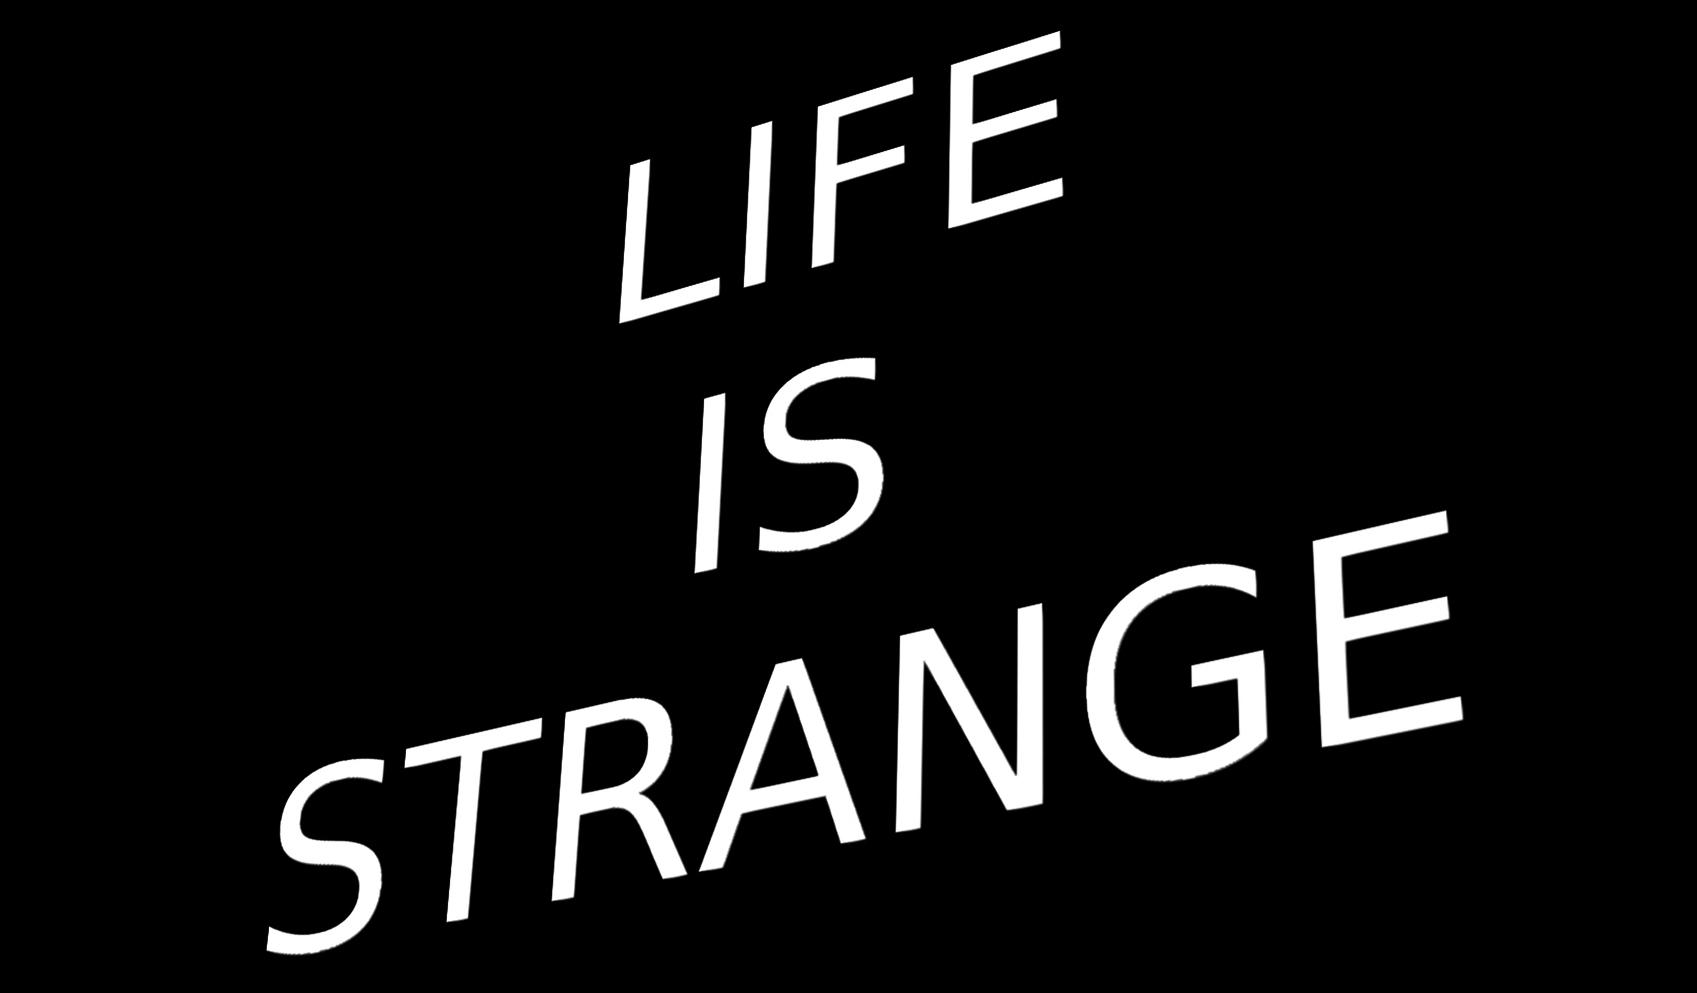 Life is strange YT